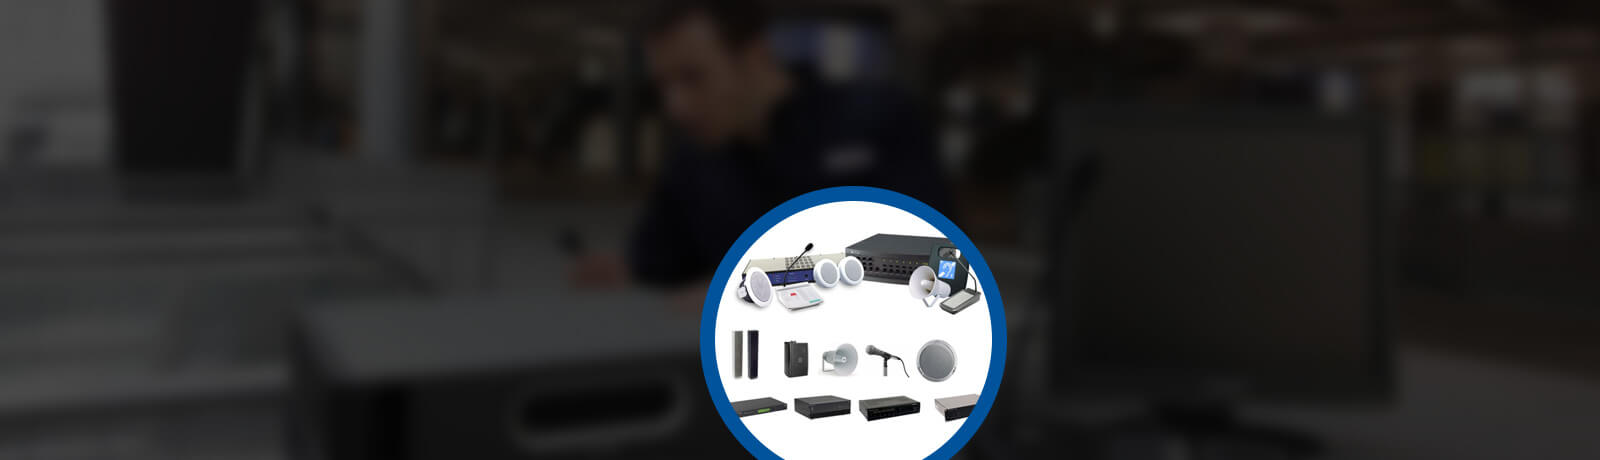 BGM System installation Services in Dubai